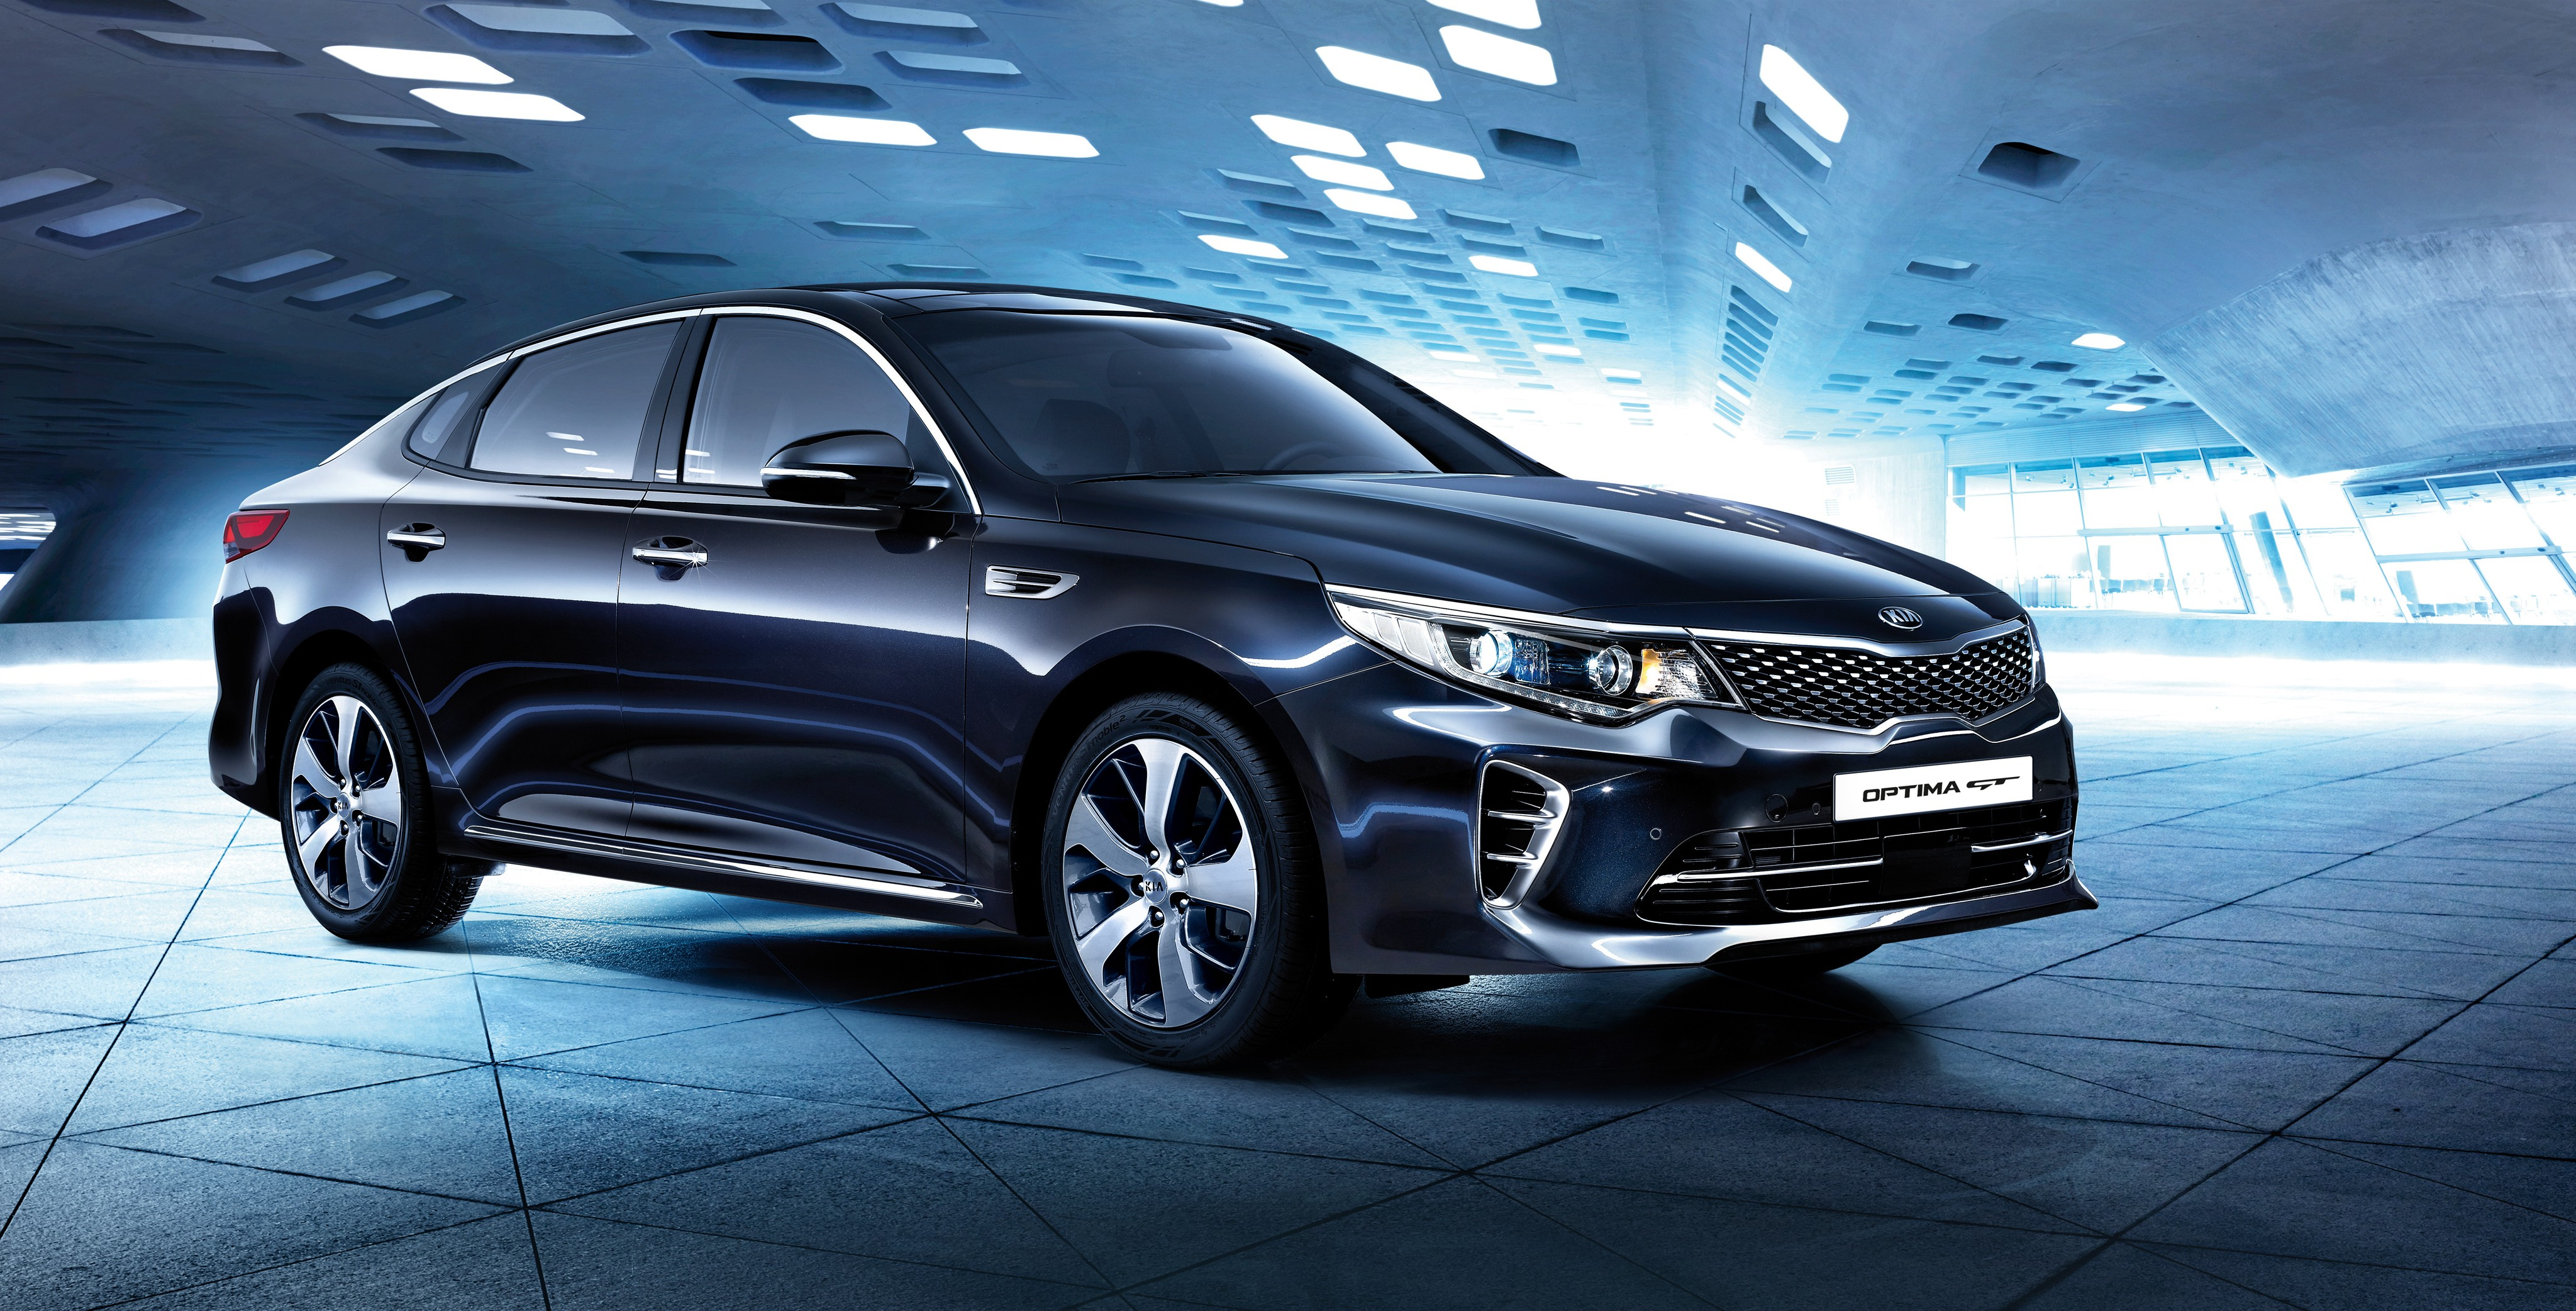 Black Luxury Vehicles: Wallpaper Kia Optima GT, Supercar, Black, Luxury Cars